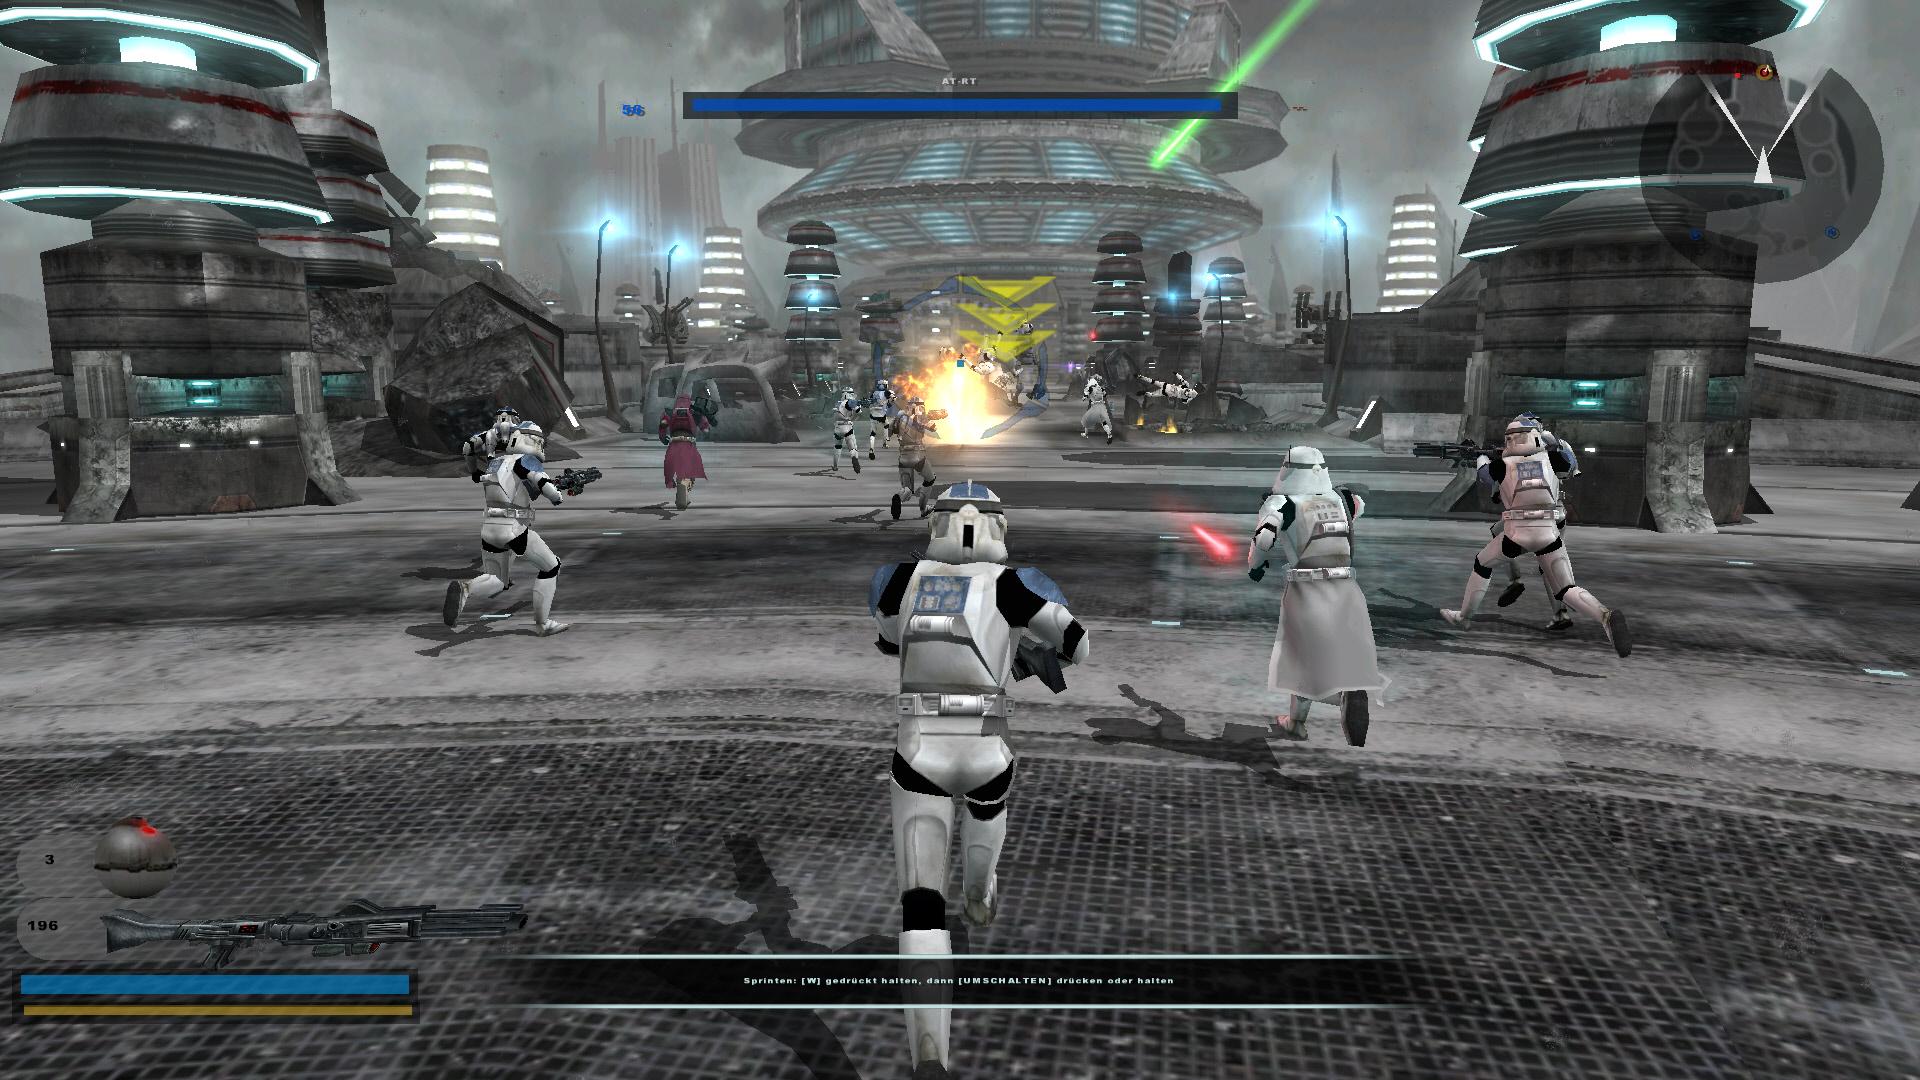 Star Wars: Battlefront 2 reaches 19 million players